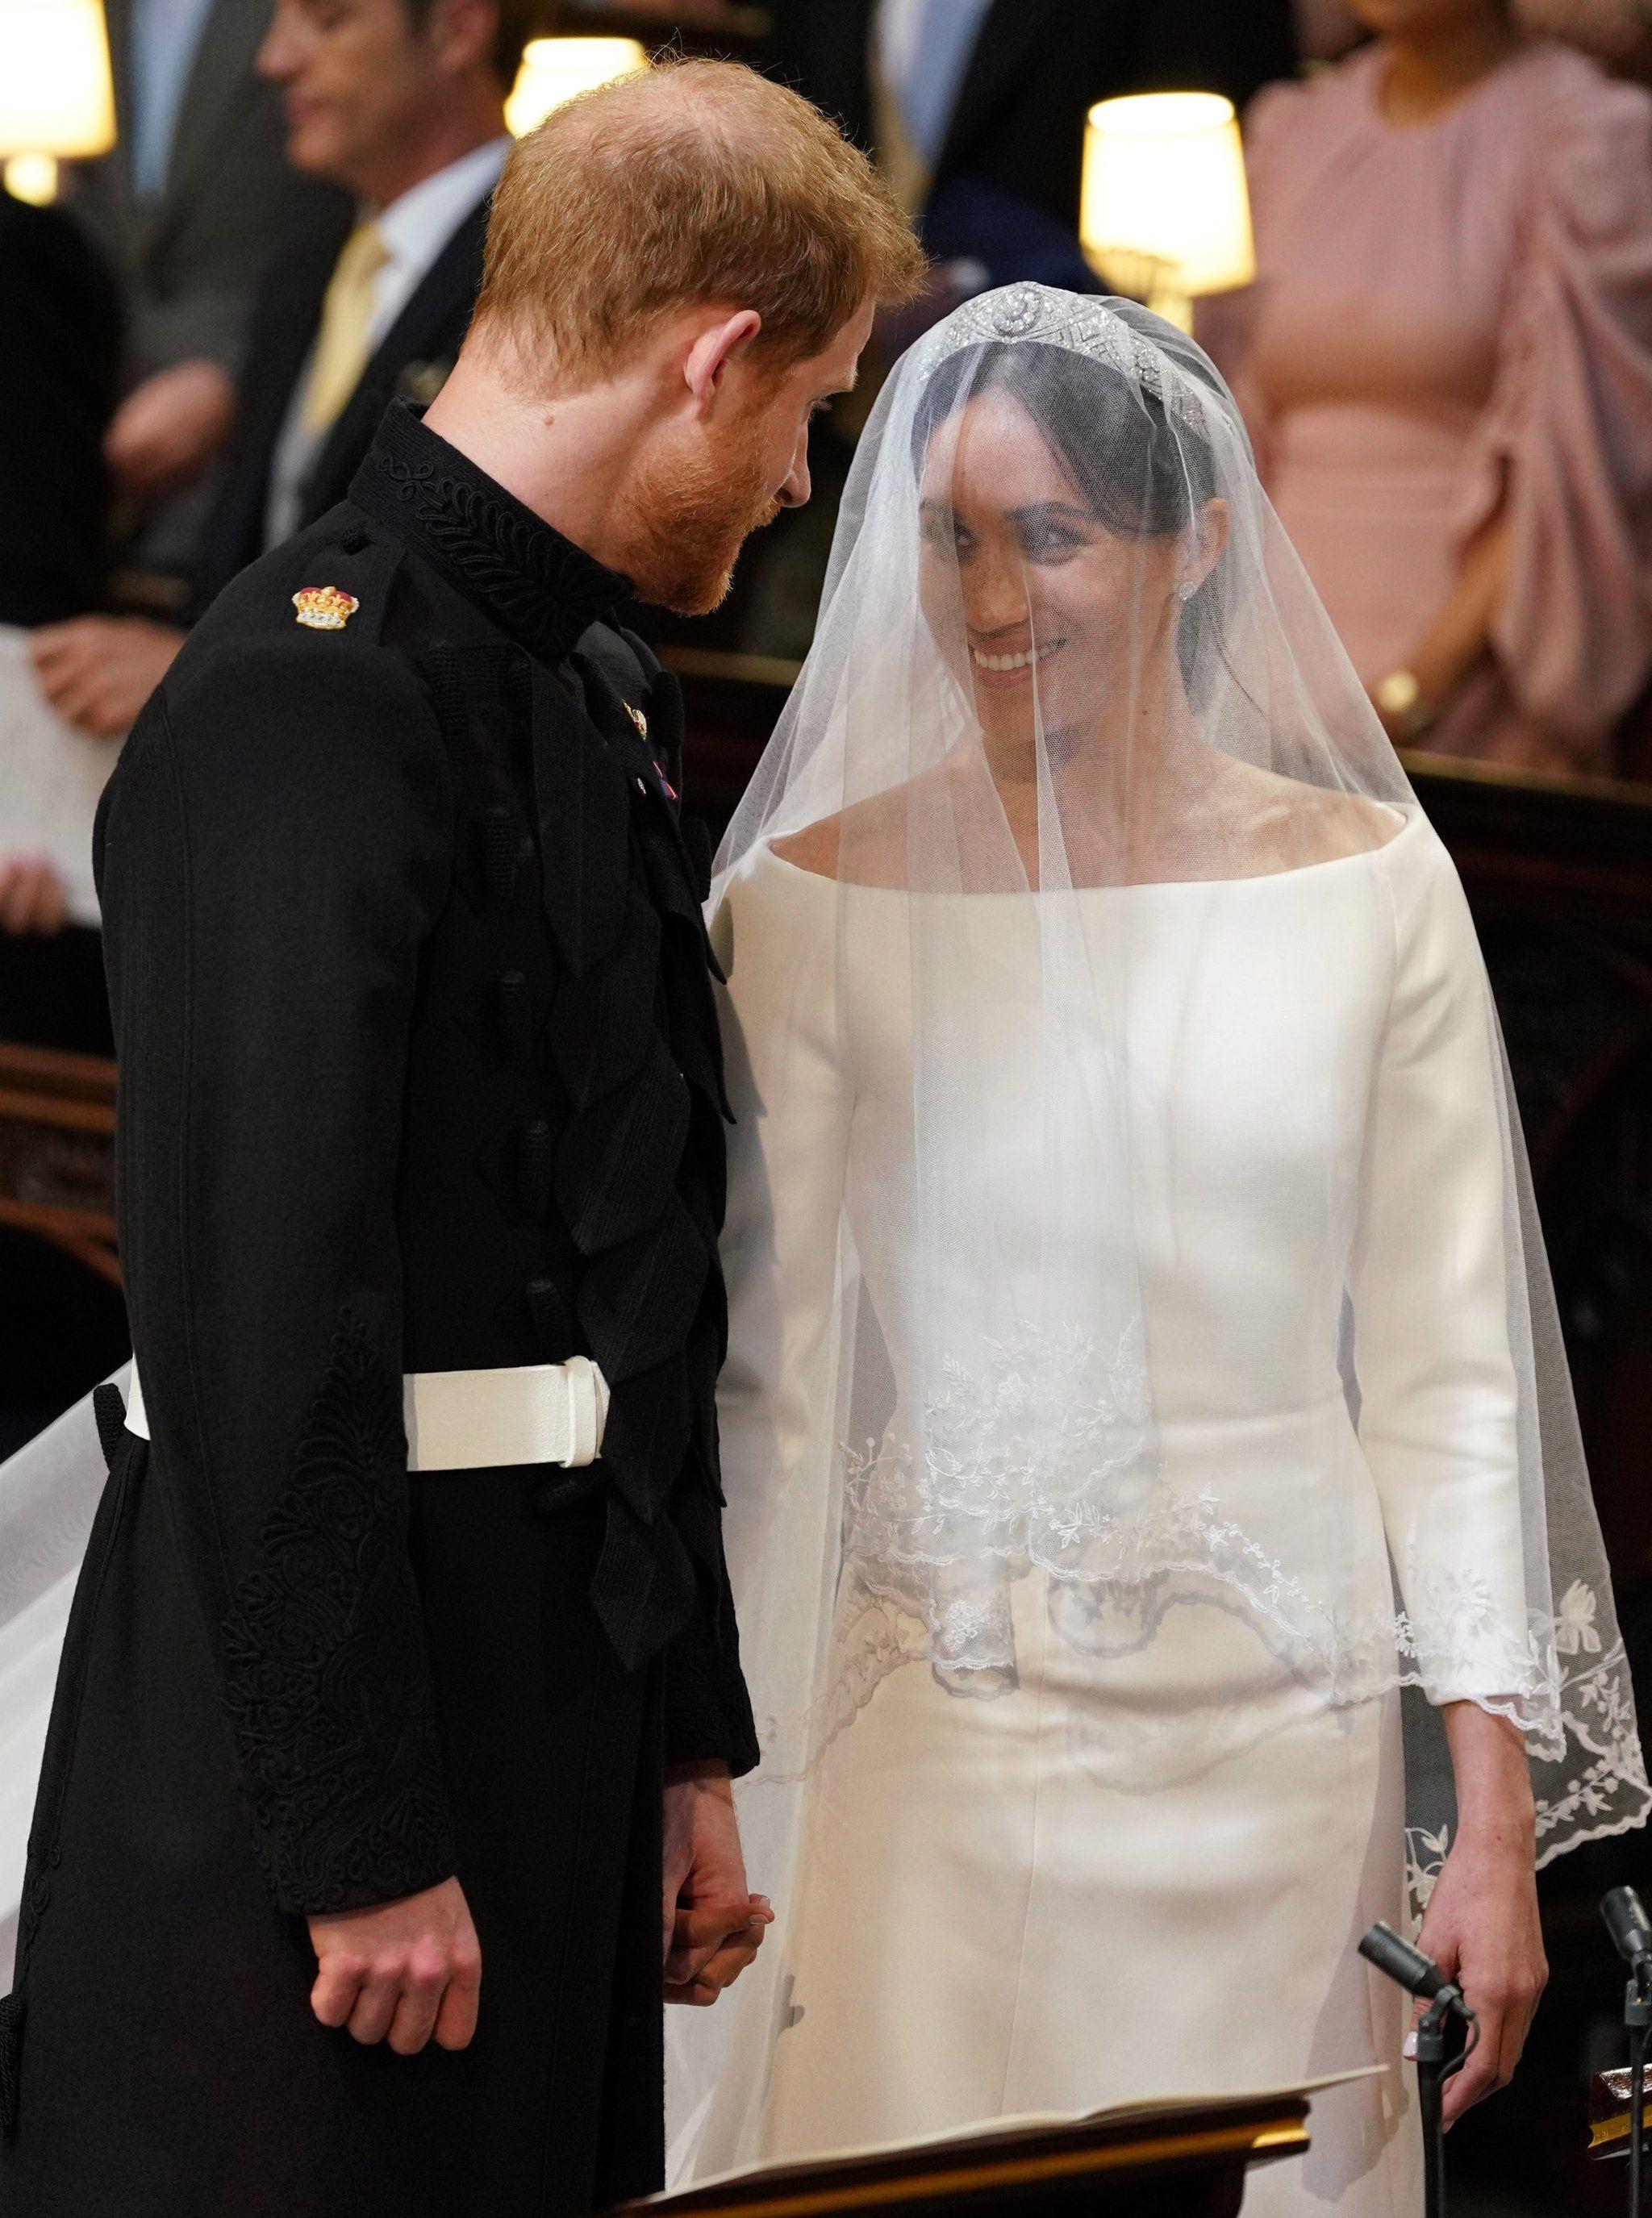 Oprah wedding dresses  We Knew Meghan Markle Would Make a Beautiful Bride but We Werenut